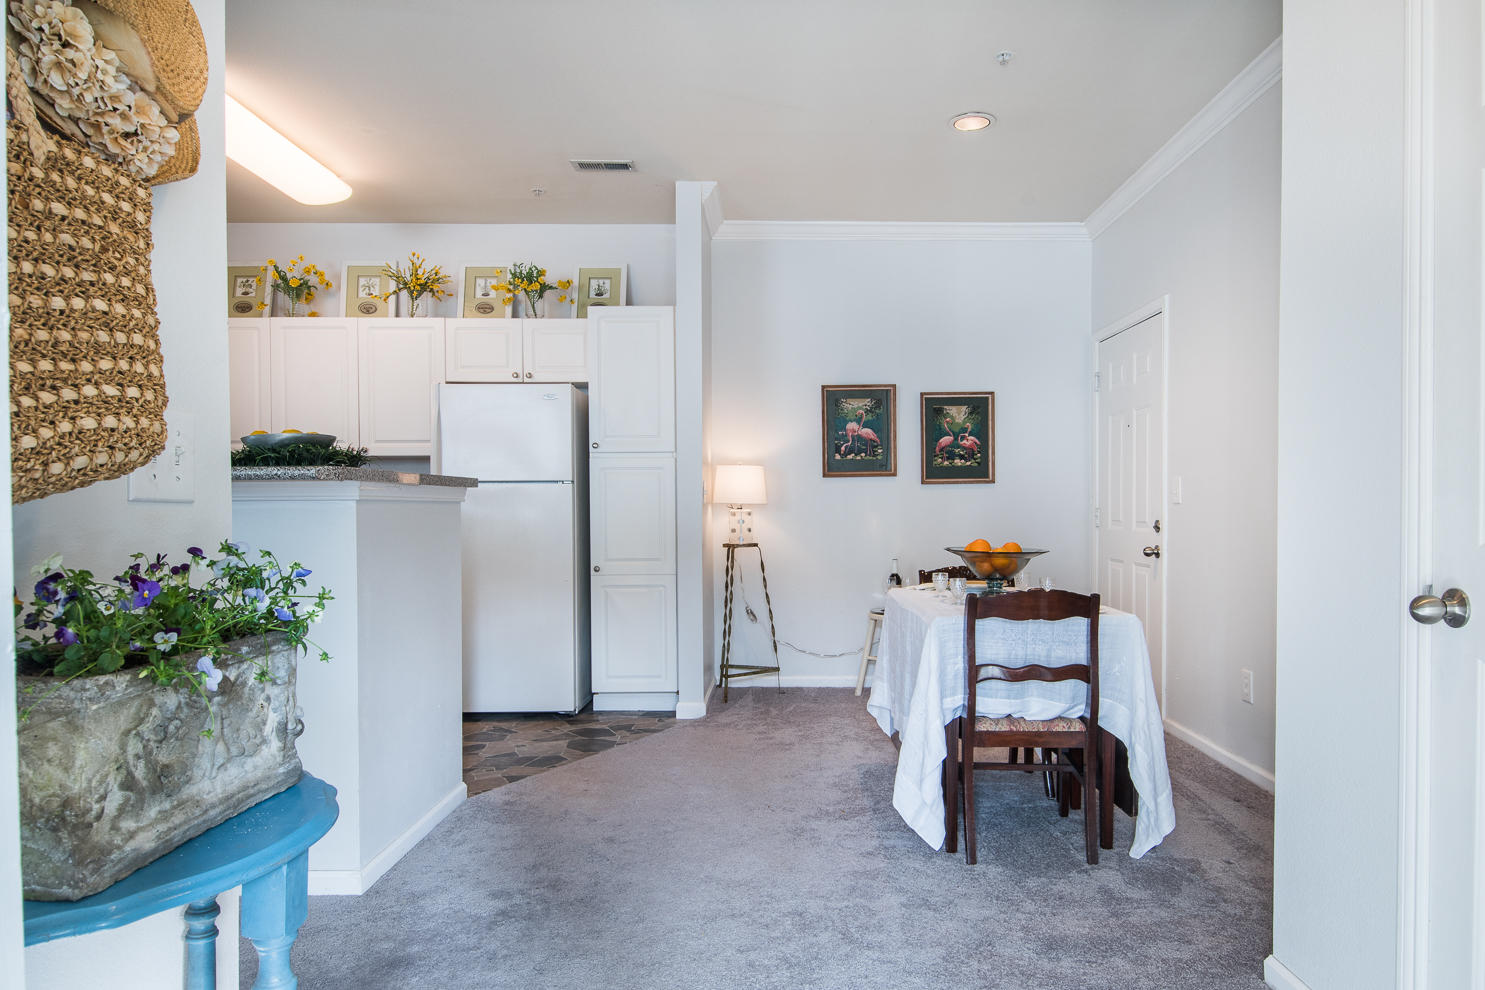 Daniel Landing Condos Homes For Sale - 130 River Landing, Charleston, SC - 29